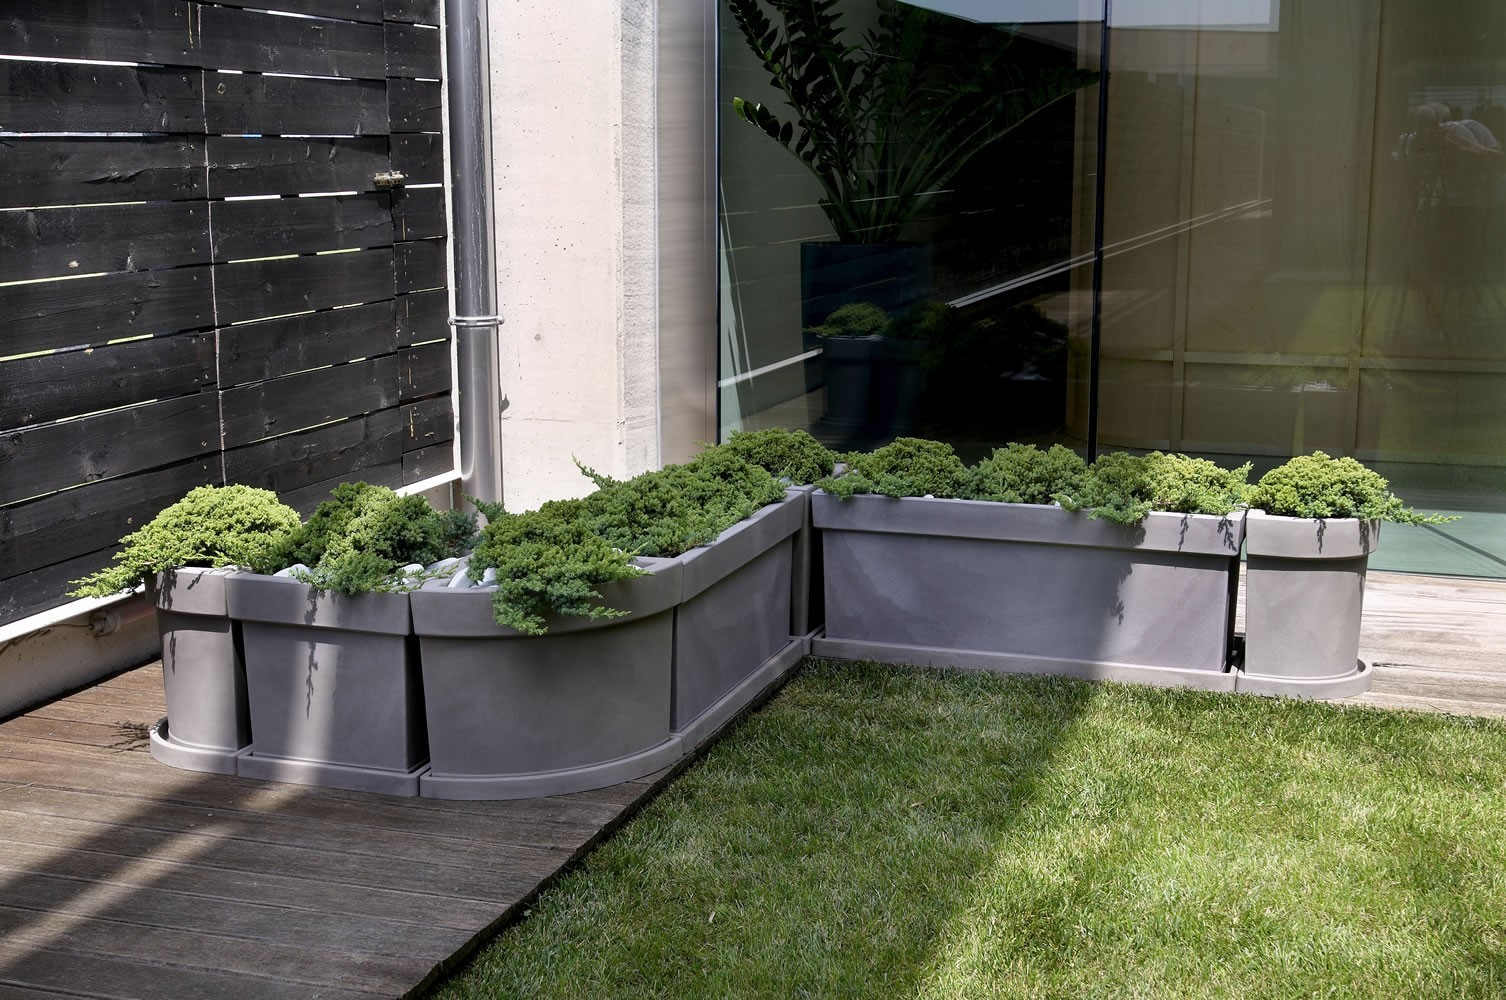 Sottovaso themis per vasi angolari nicoli for Vasi per terrazzi in resina